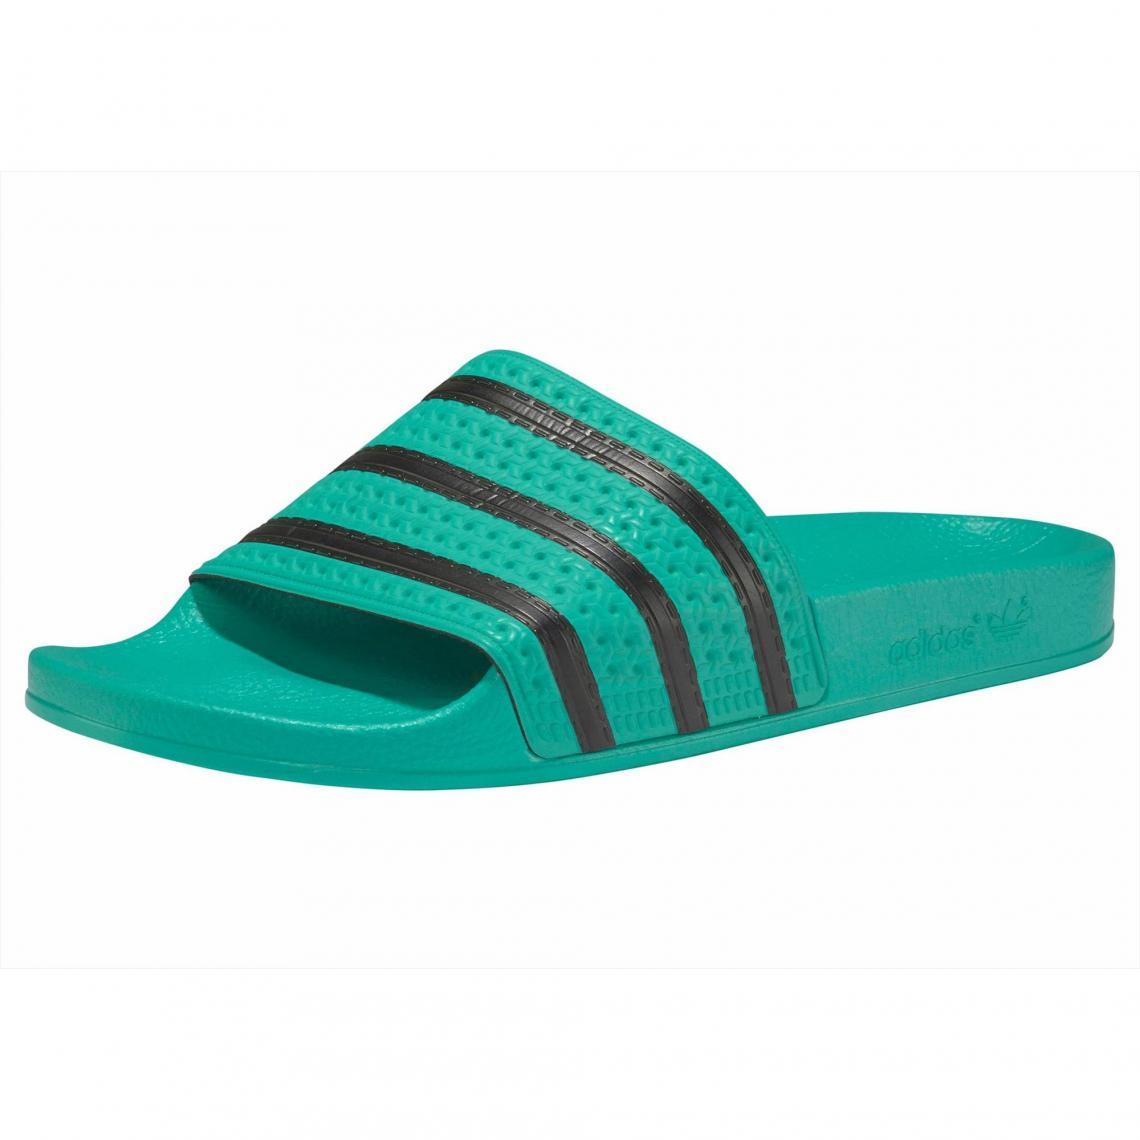 purchase cheap 7fc37 2770b Mules Adidas Originals